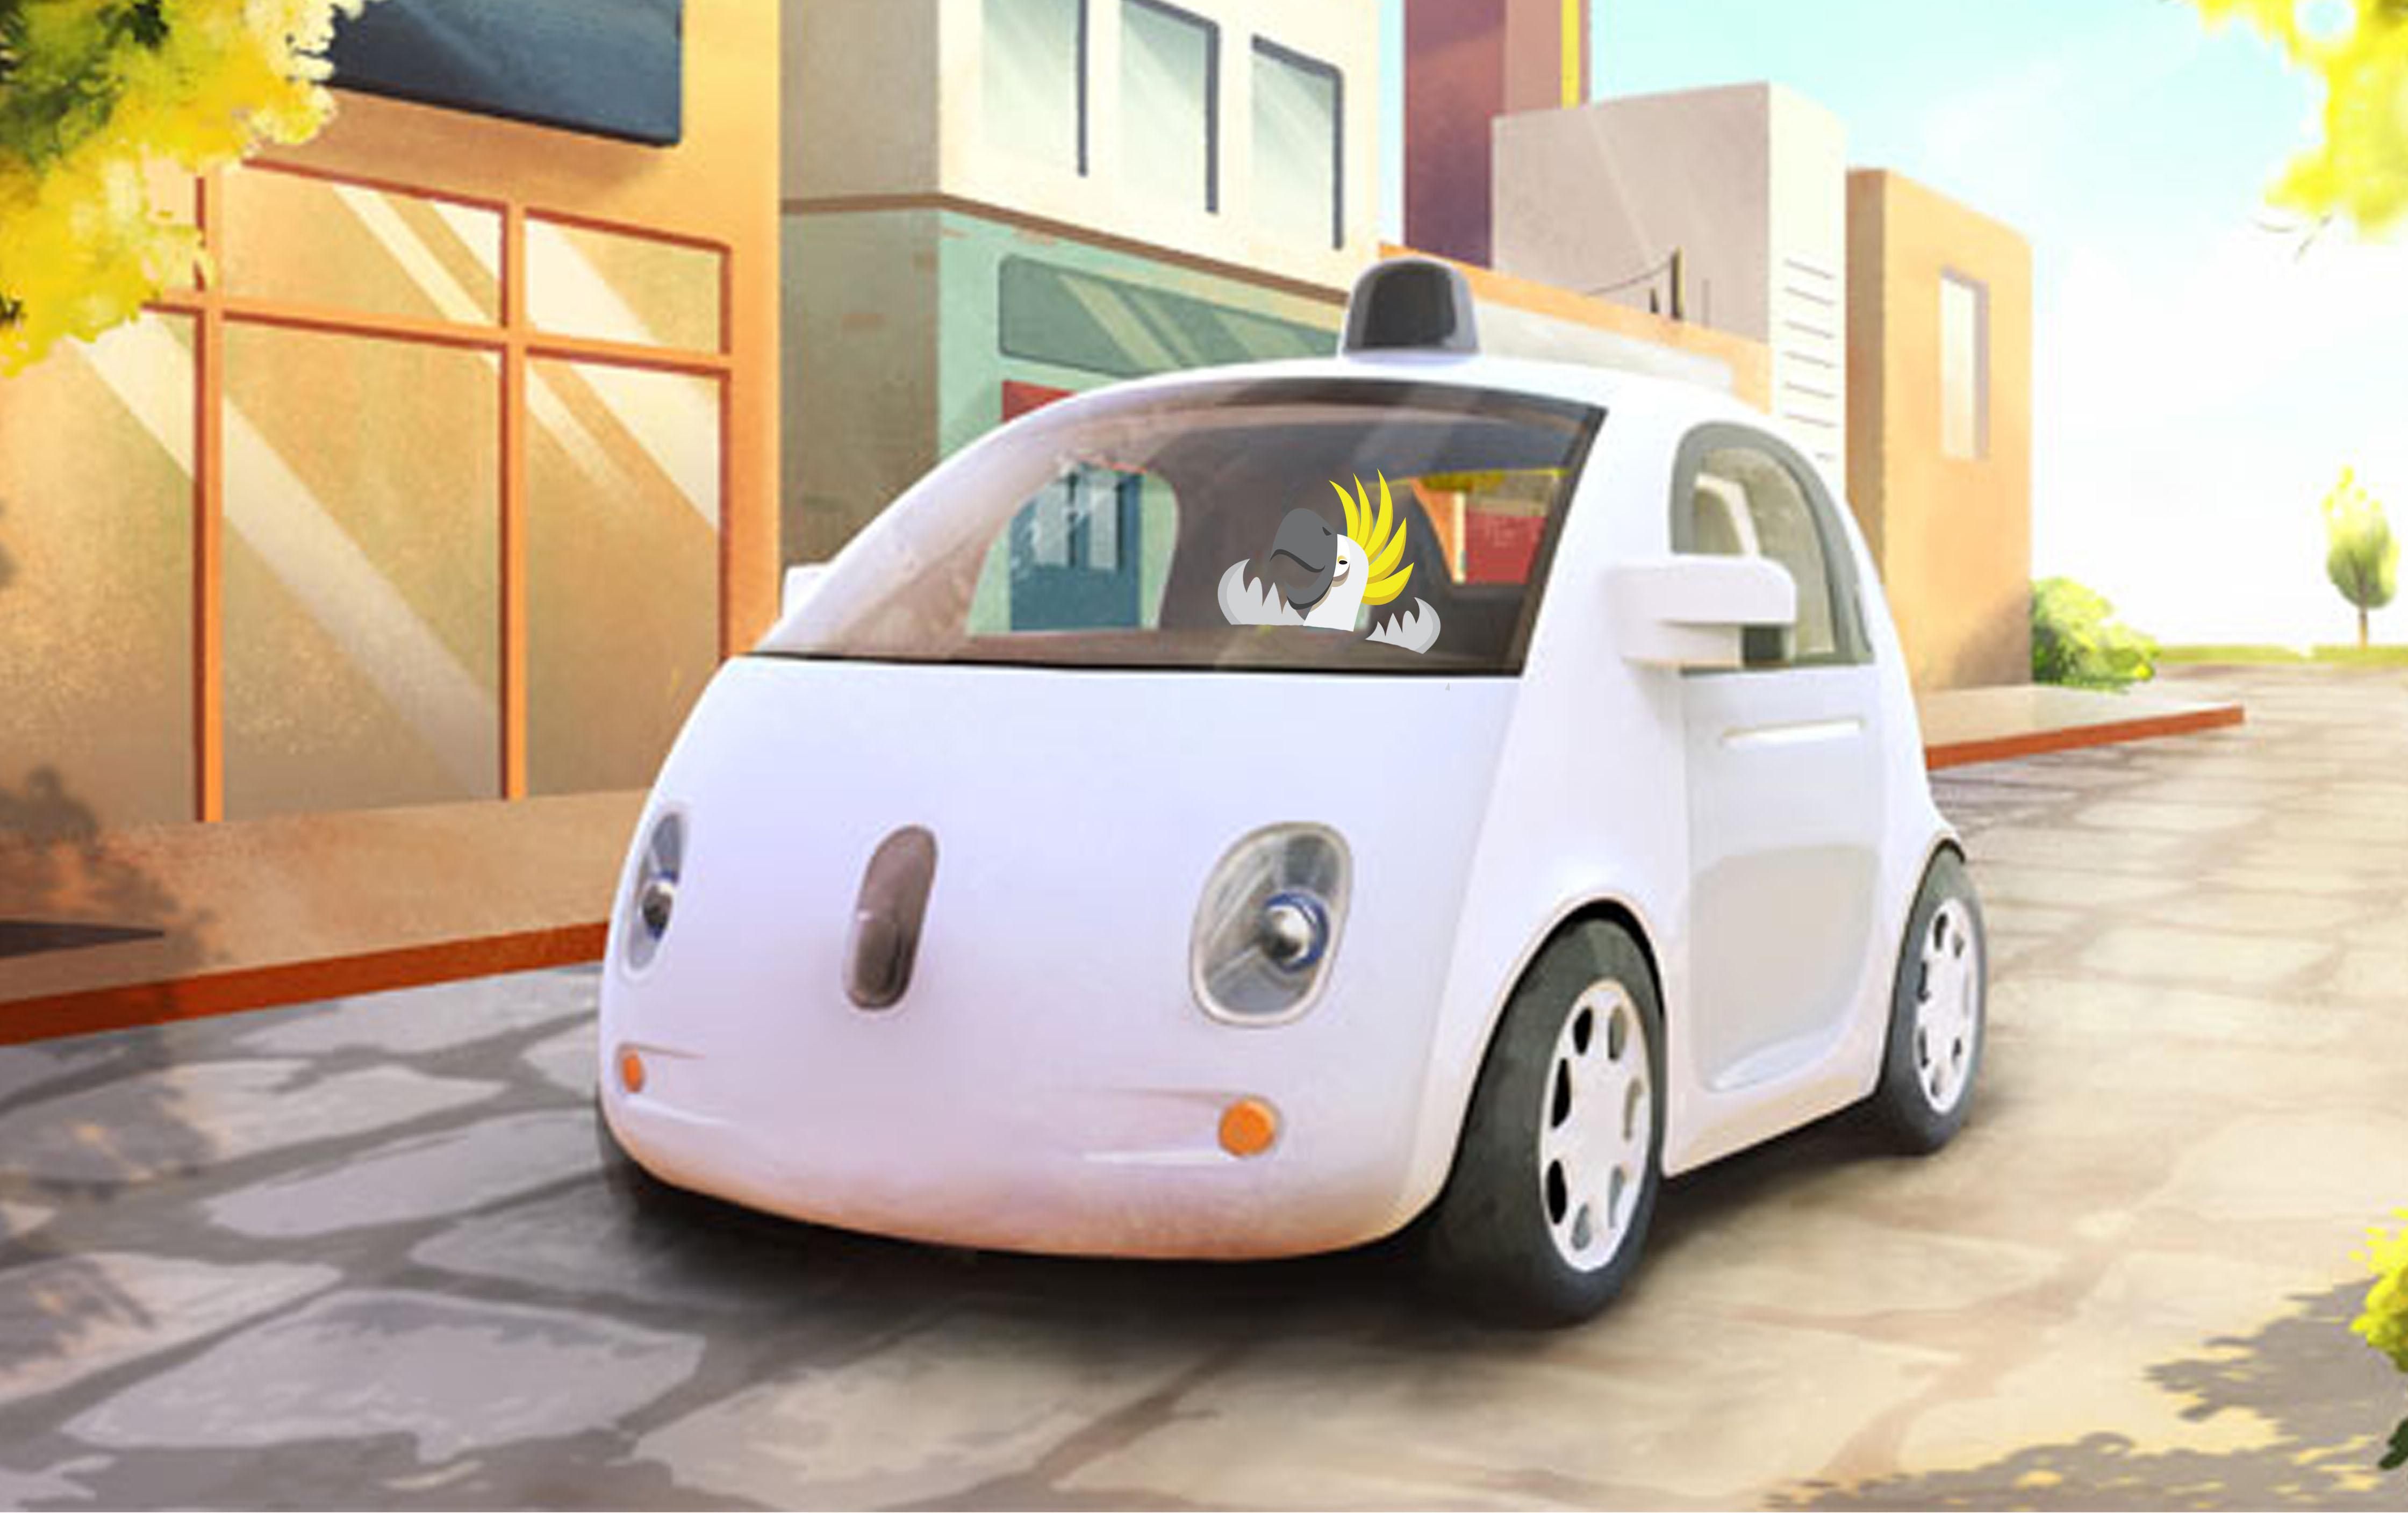 driverless car Bob